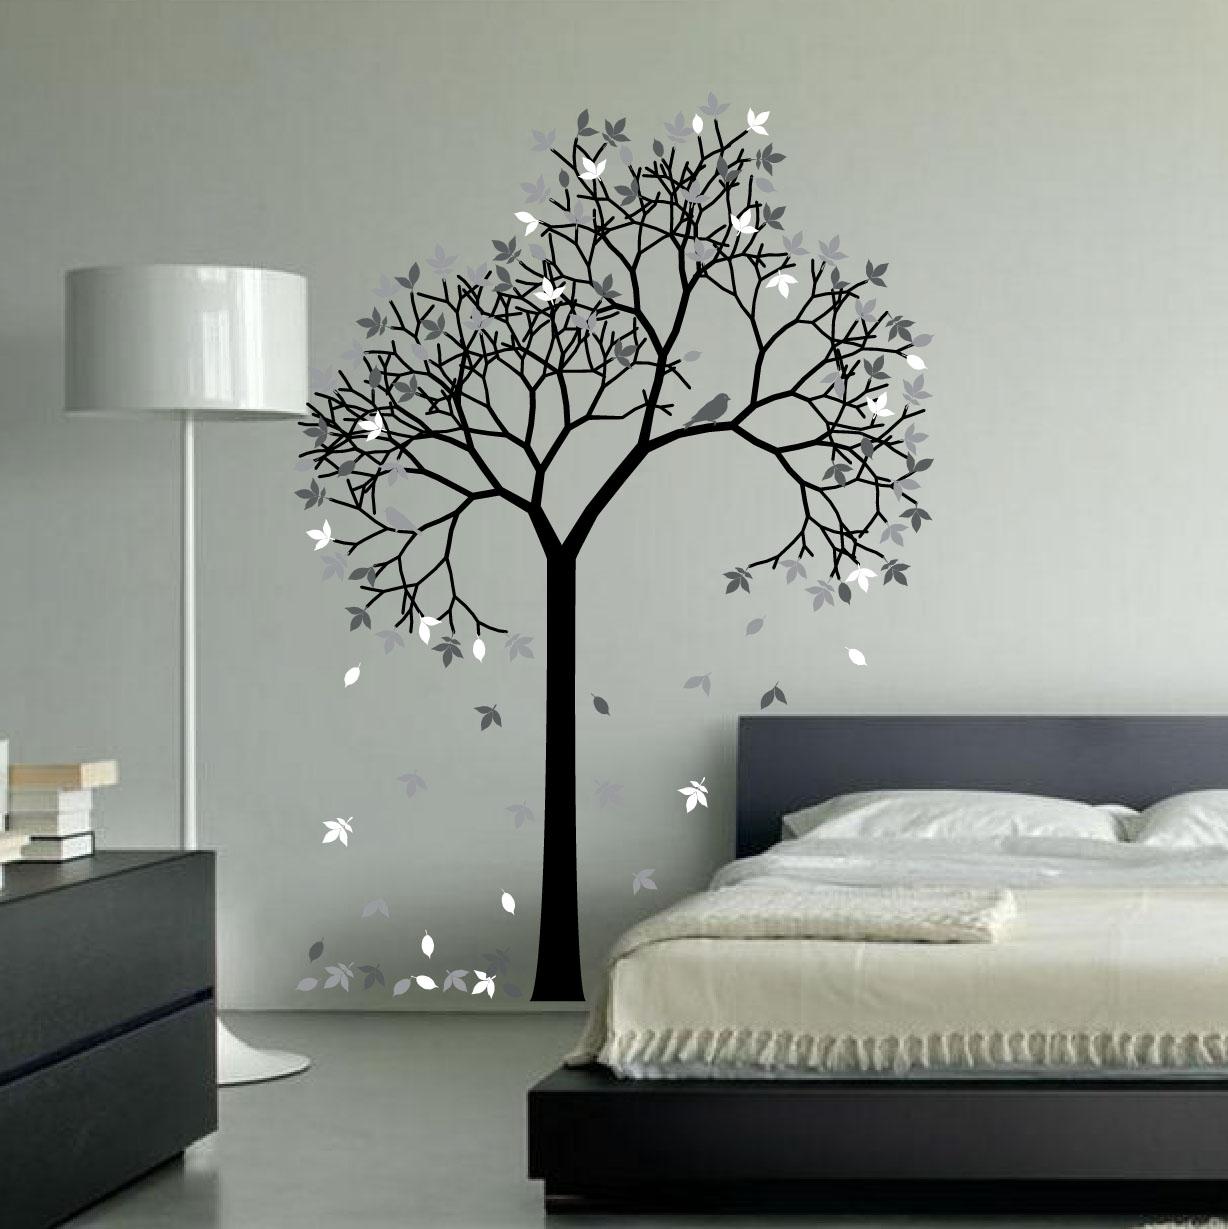 Ordinaire 1267 Tree Wall Decal Bedroom